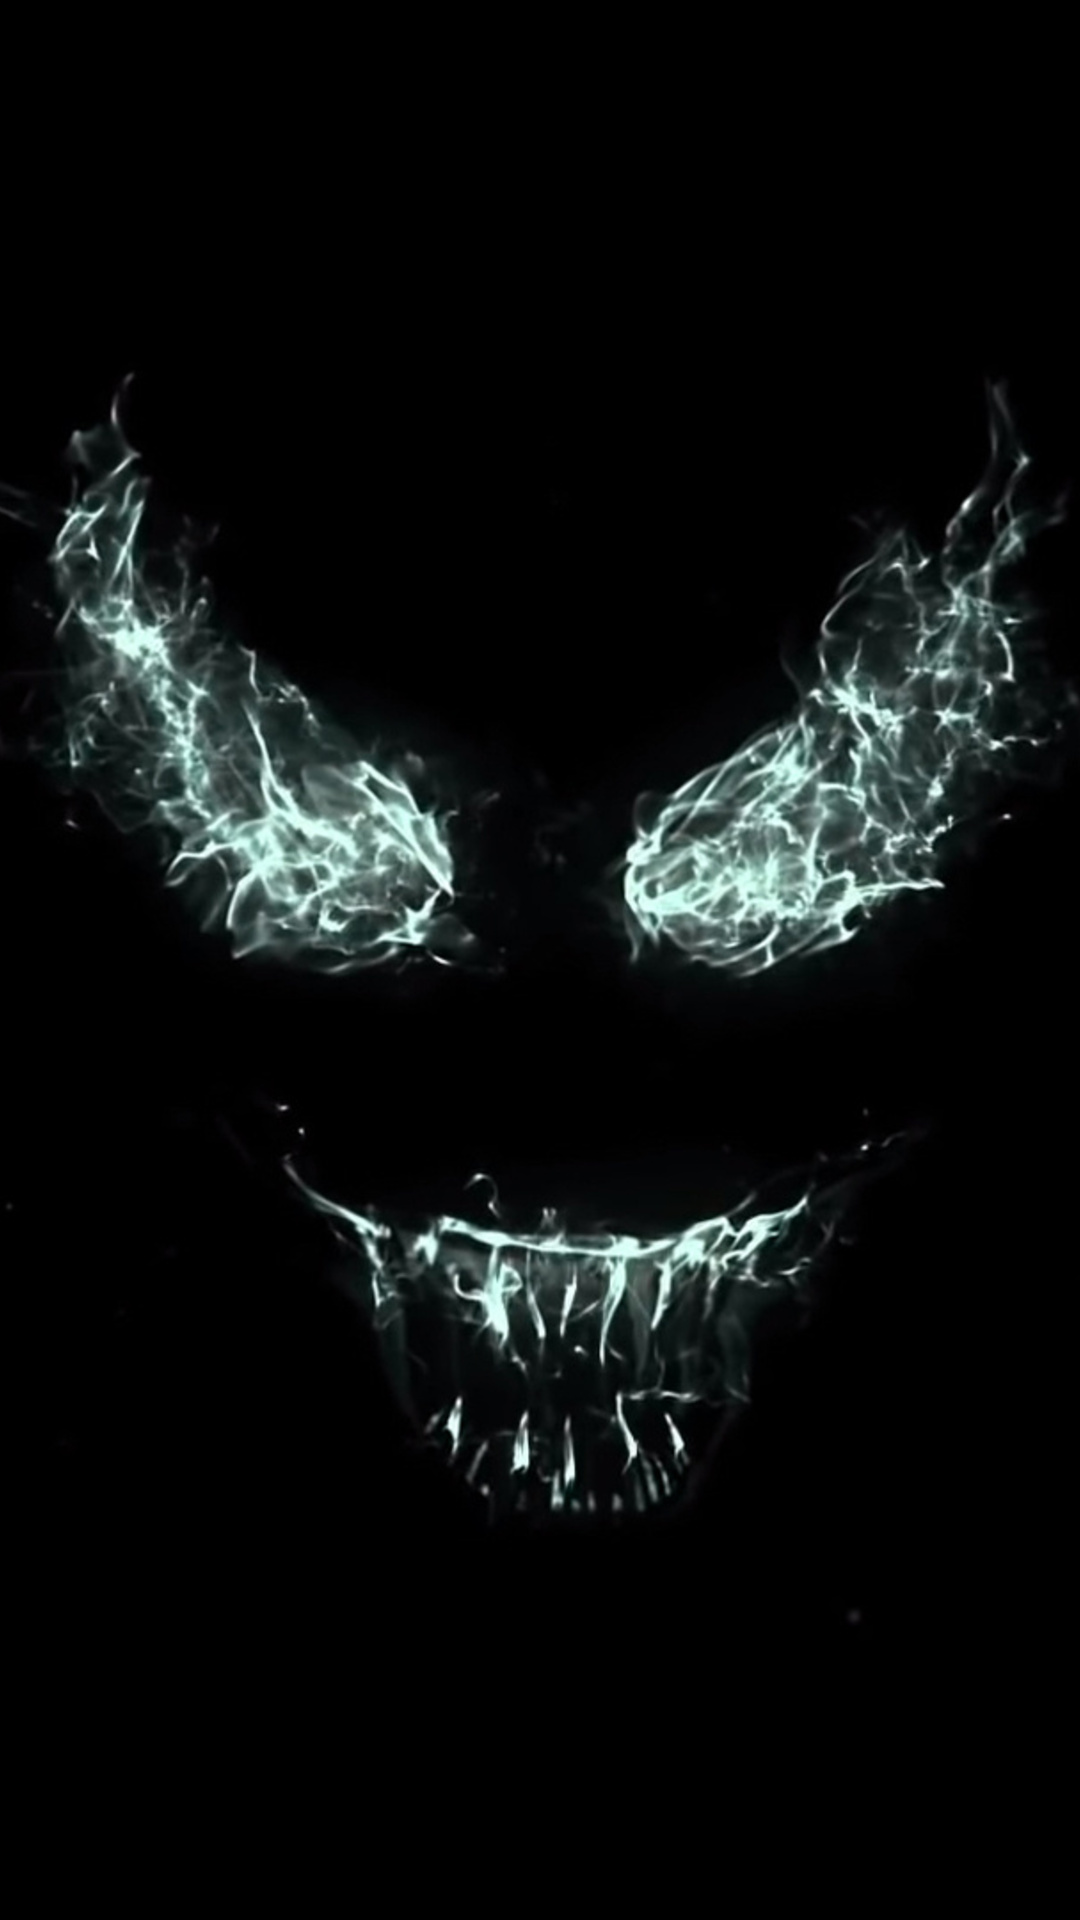 1080x1920 Venom Movie 2018 Iphone 7,6s,6 Plus, Pixel Xl